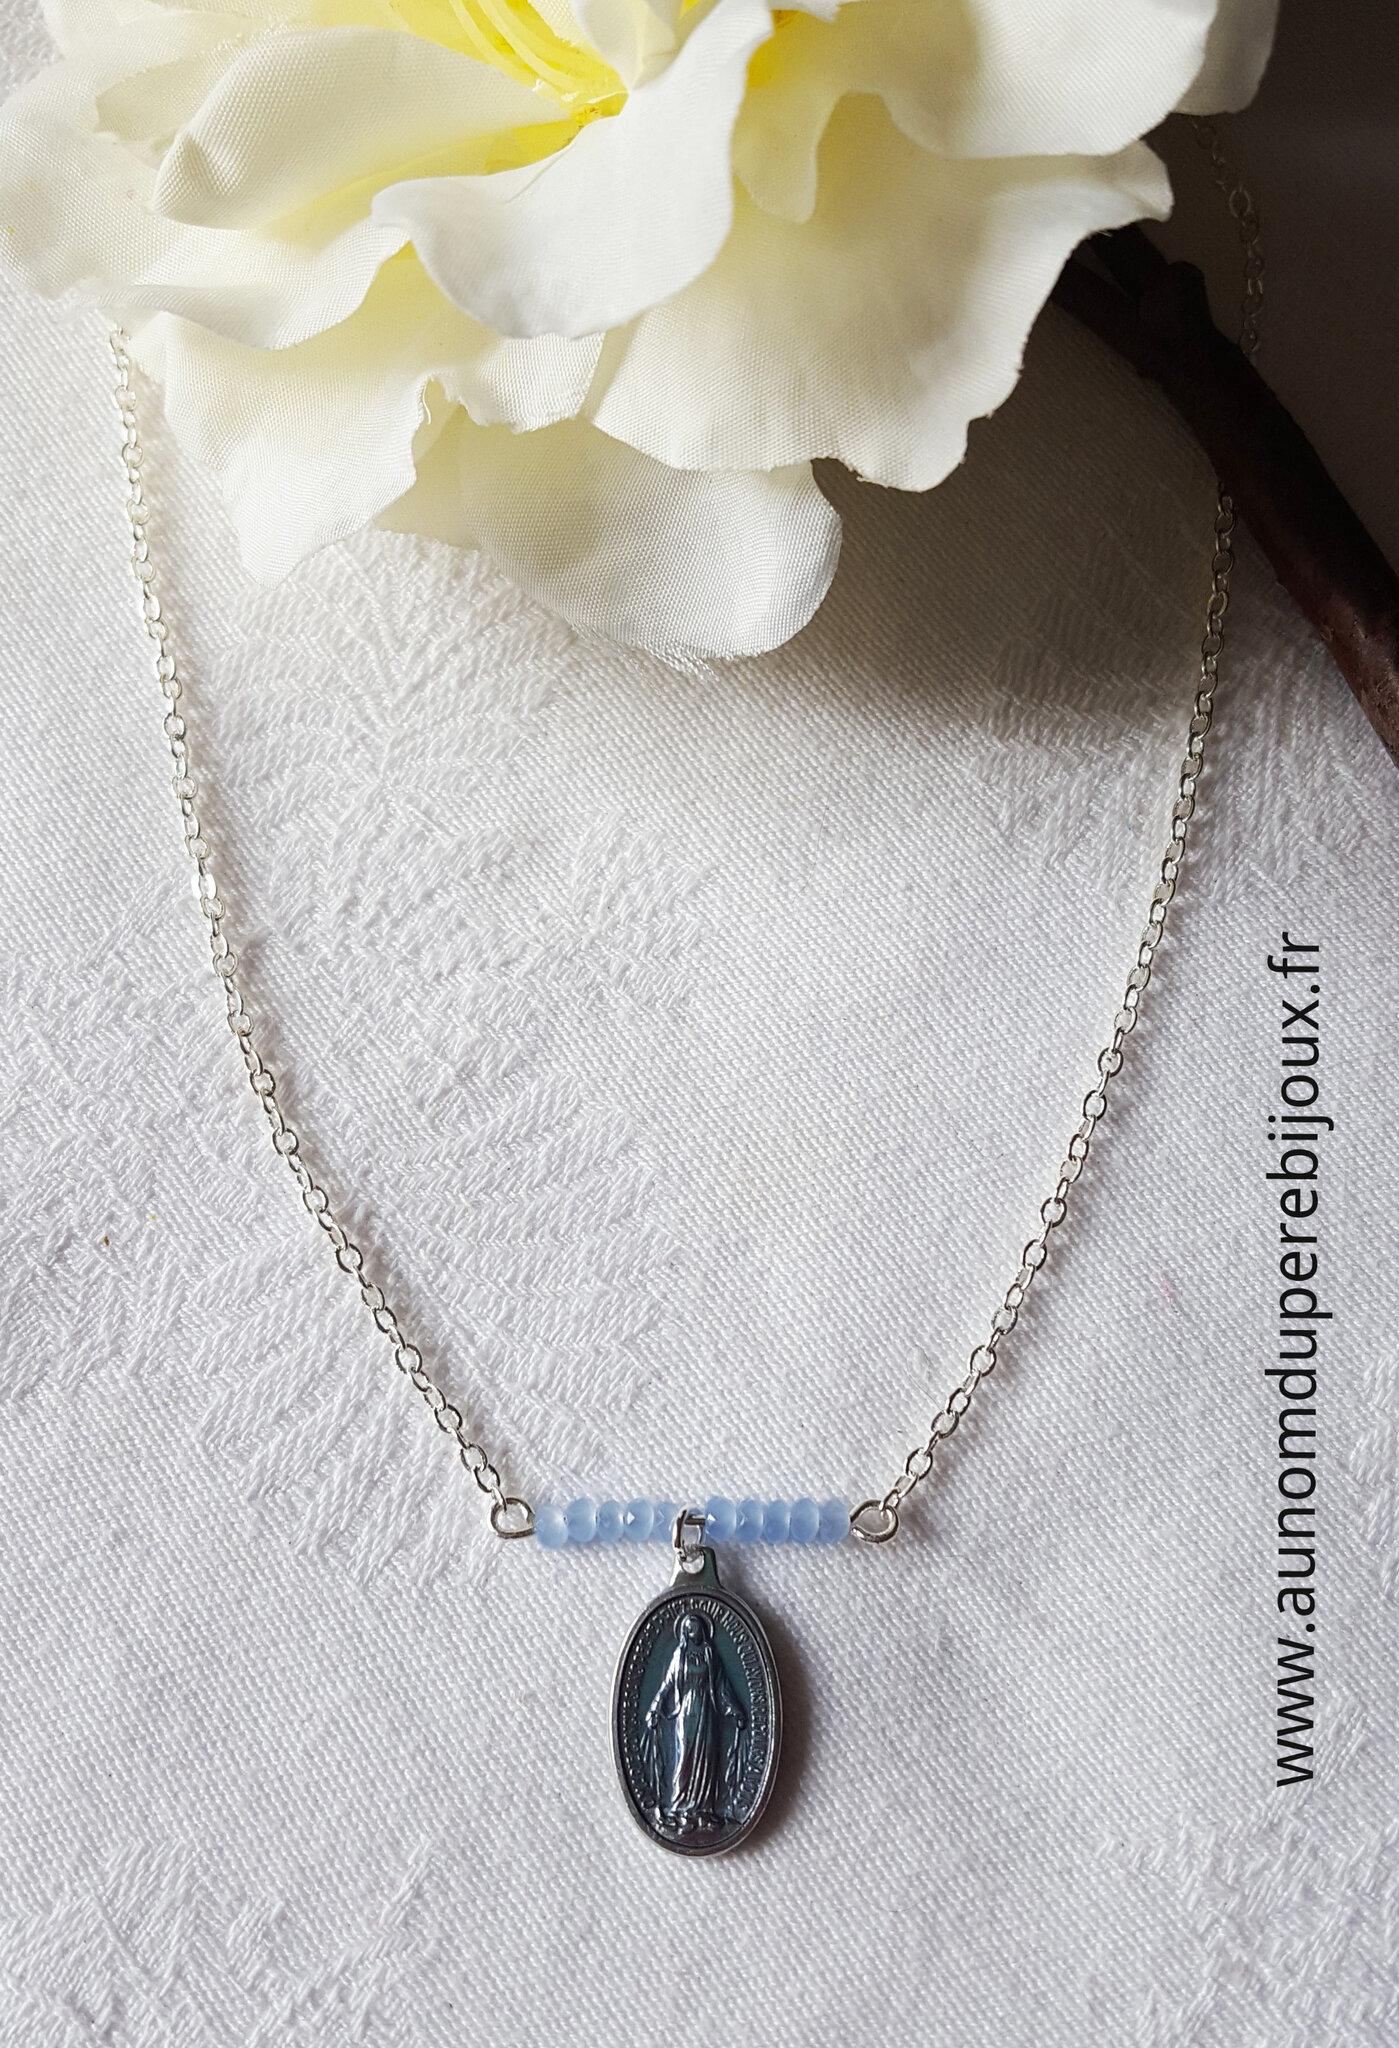 Collier Maria (bleu clair) - 15 €